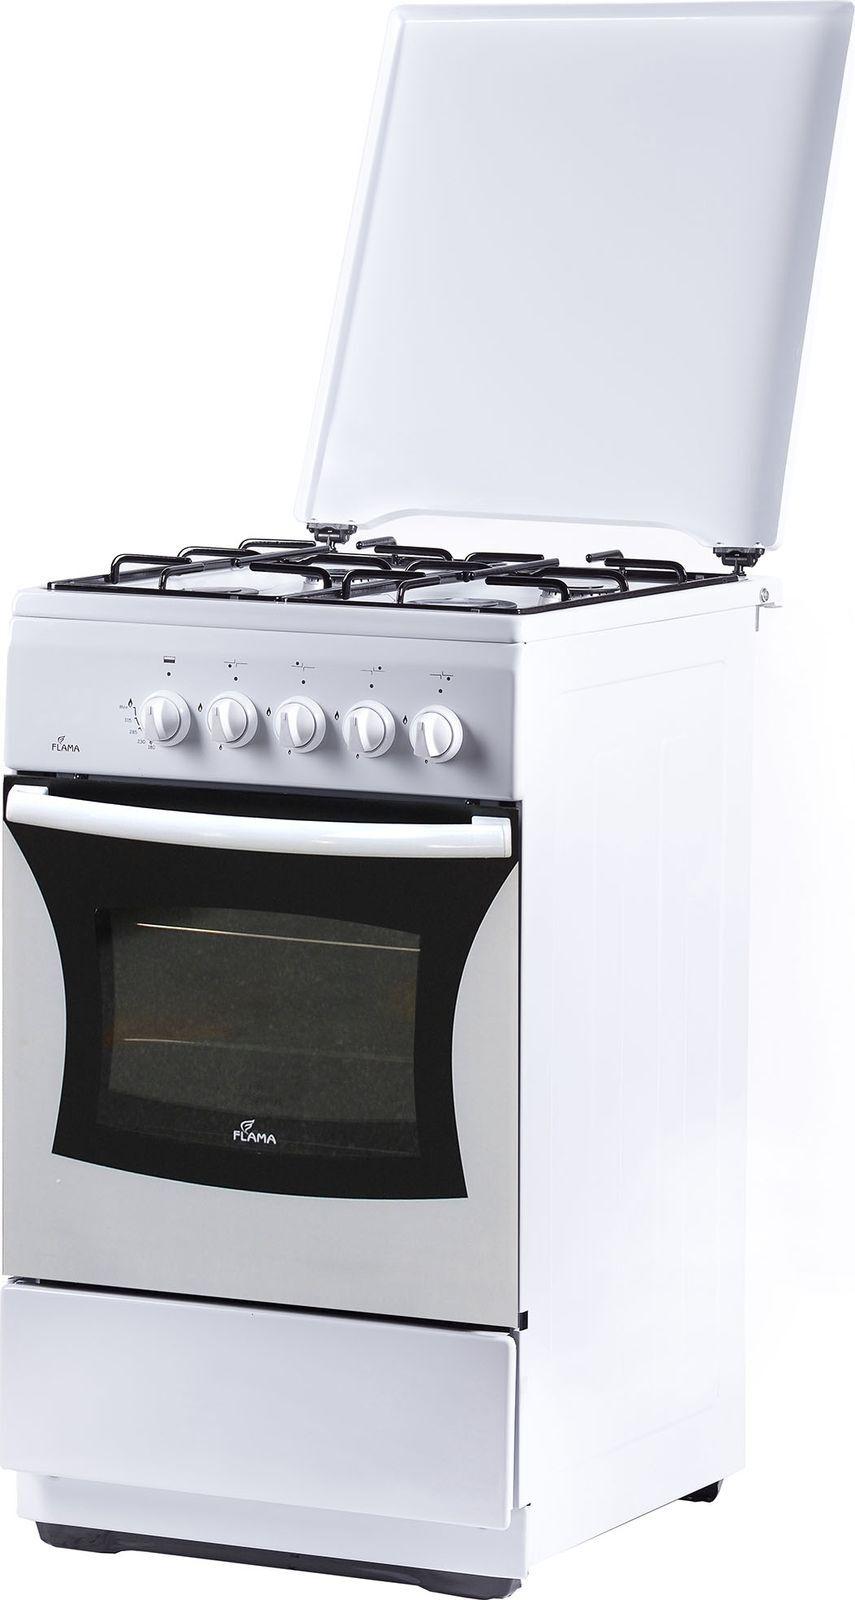 Кухонная плита Flama FG 24023 W, белый